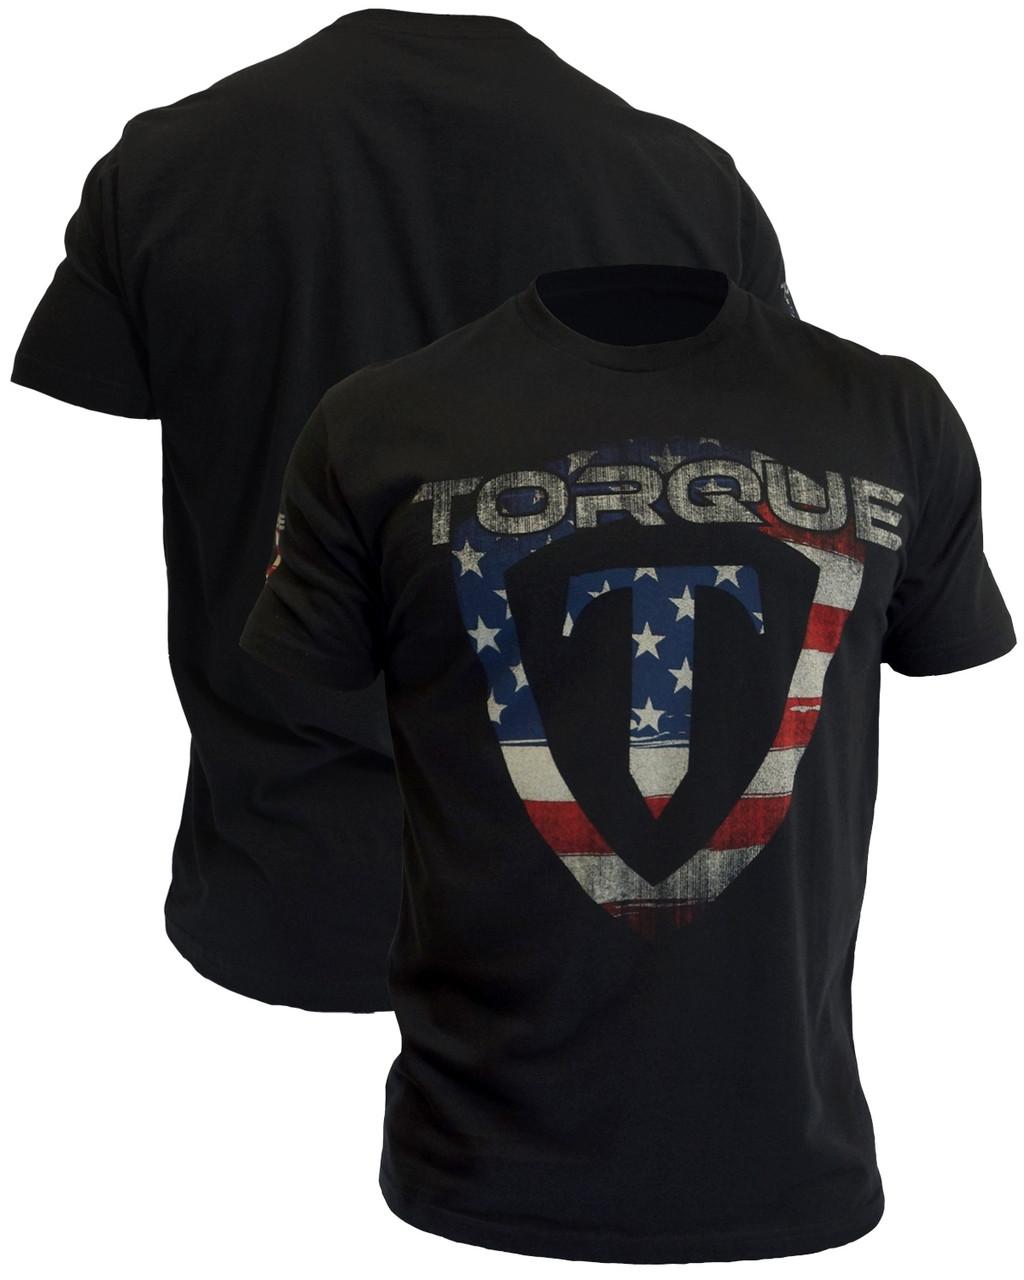 Dethrone Dethrone Ready Banner Tee Black McGregorT-Shirt MMA UFC Boxing